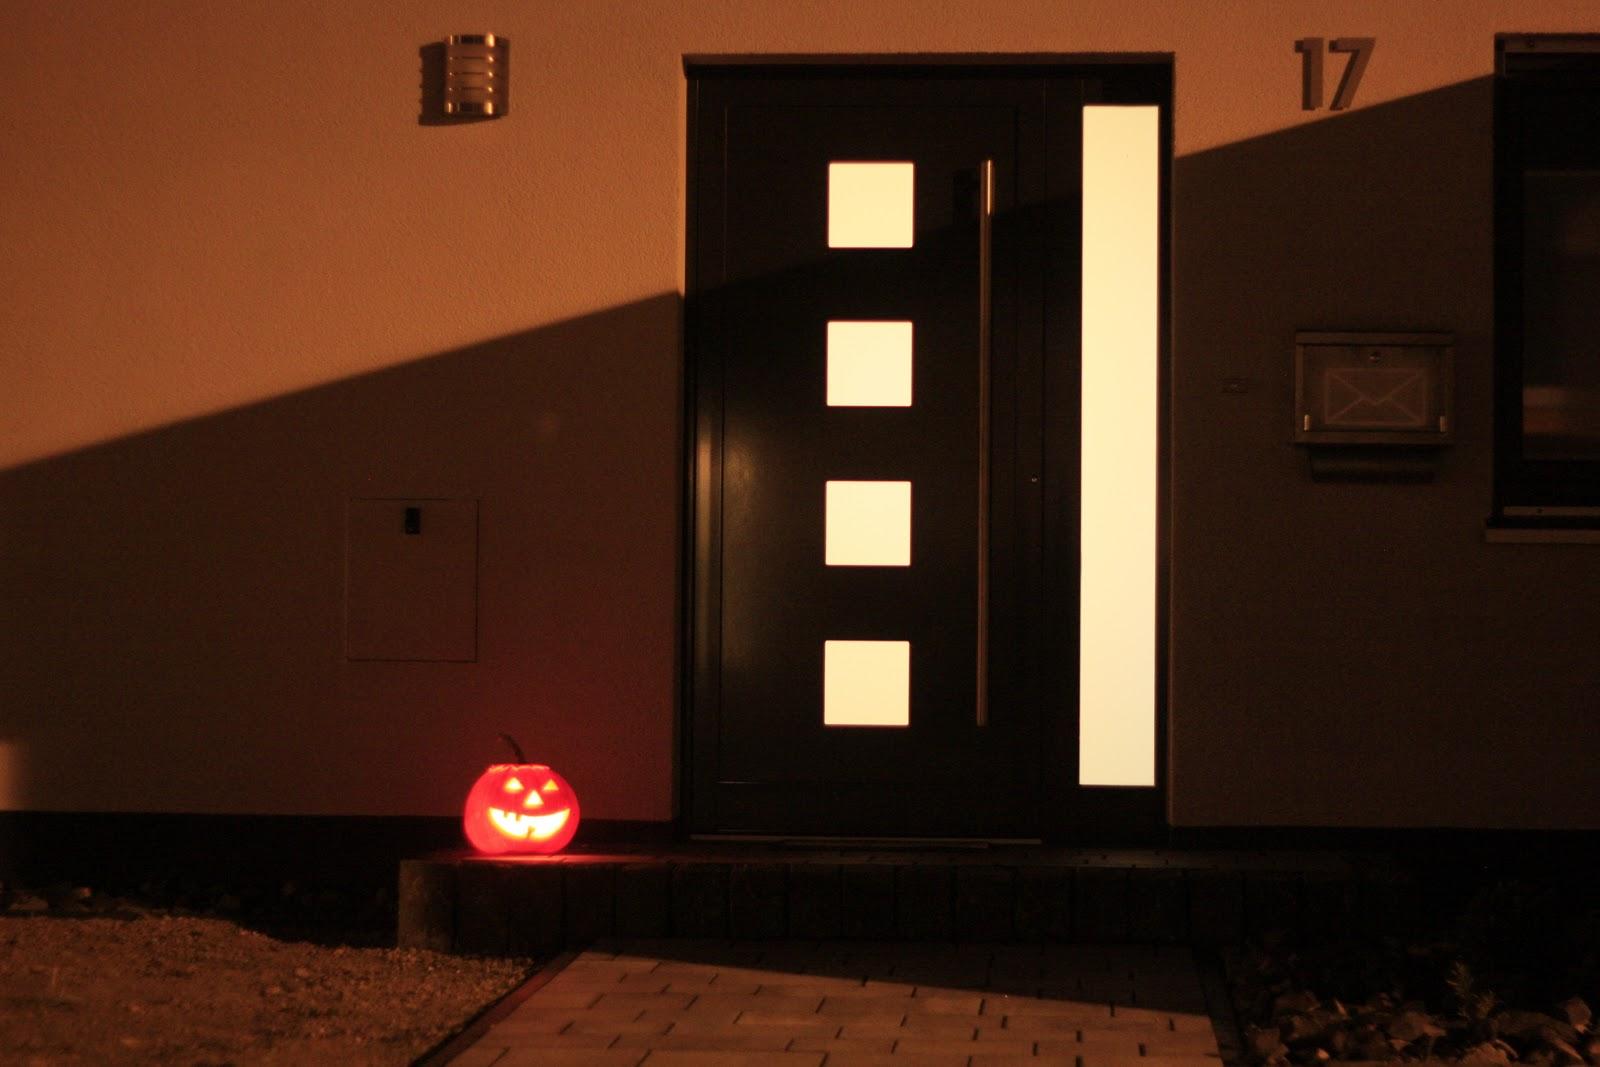 bautagebuch oleg und natja oktober 2011. Black Bedroom Furniture Sets. Home Design Ideas